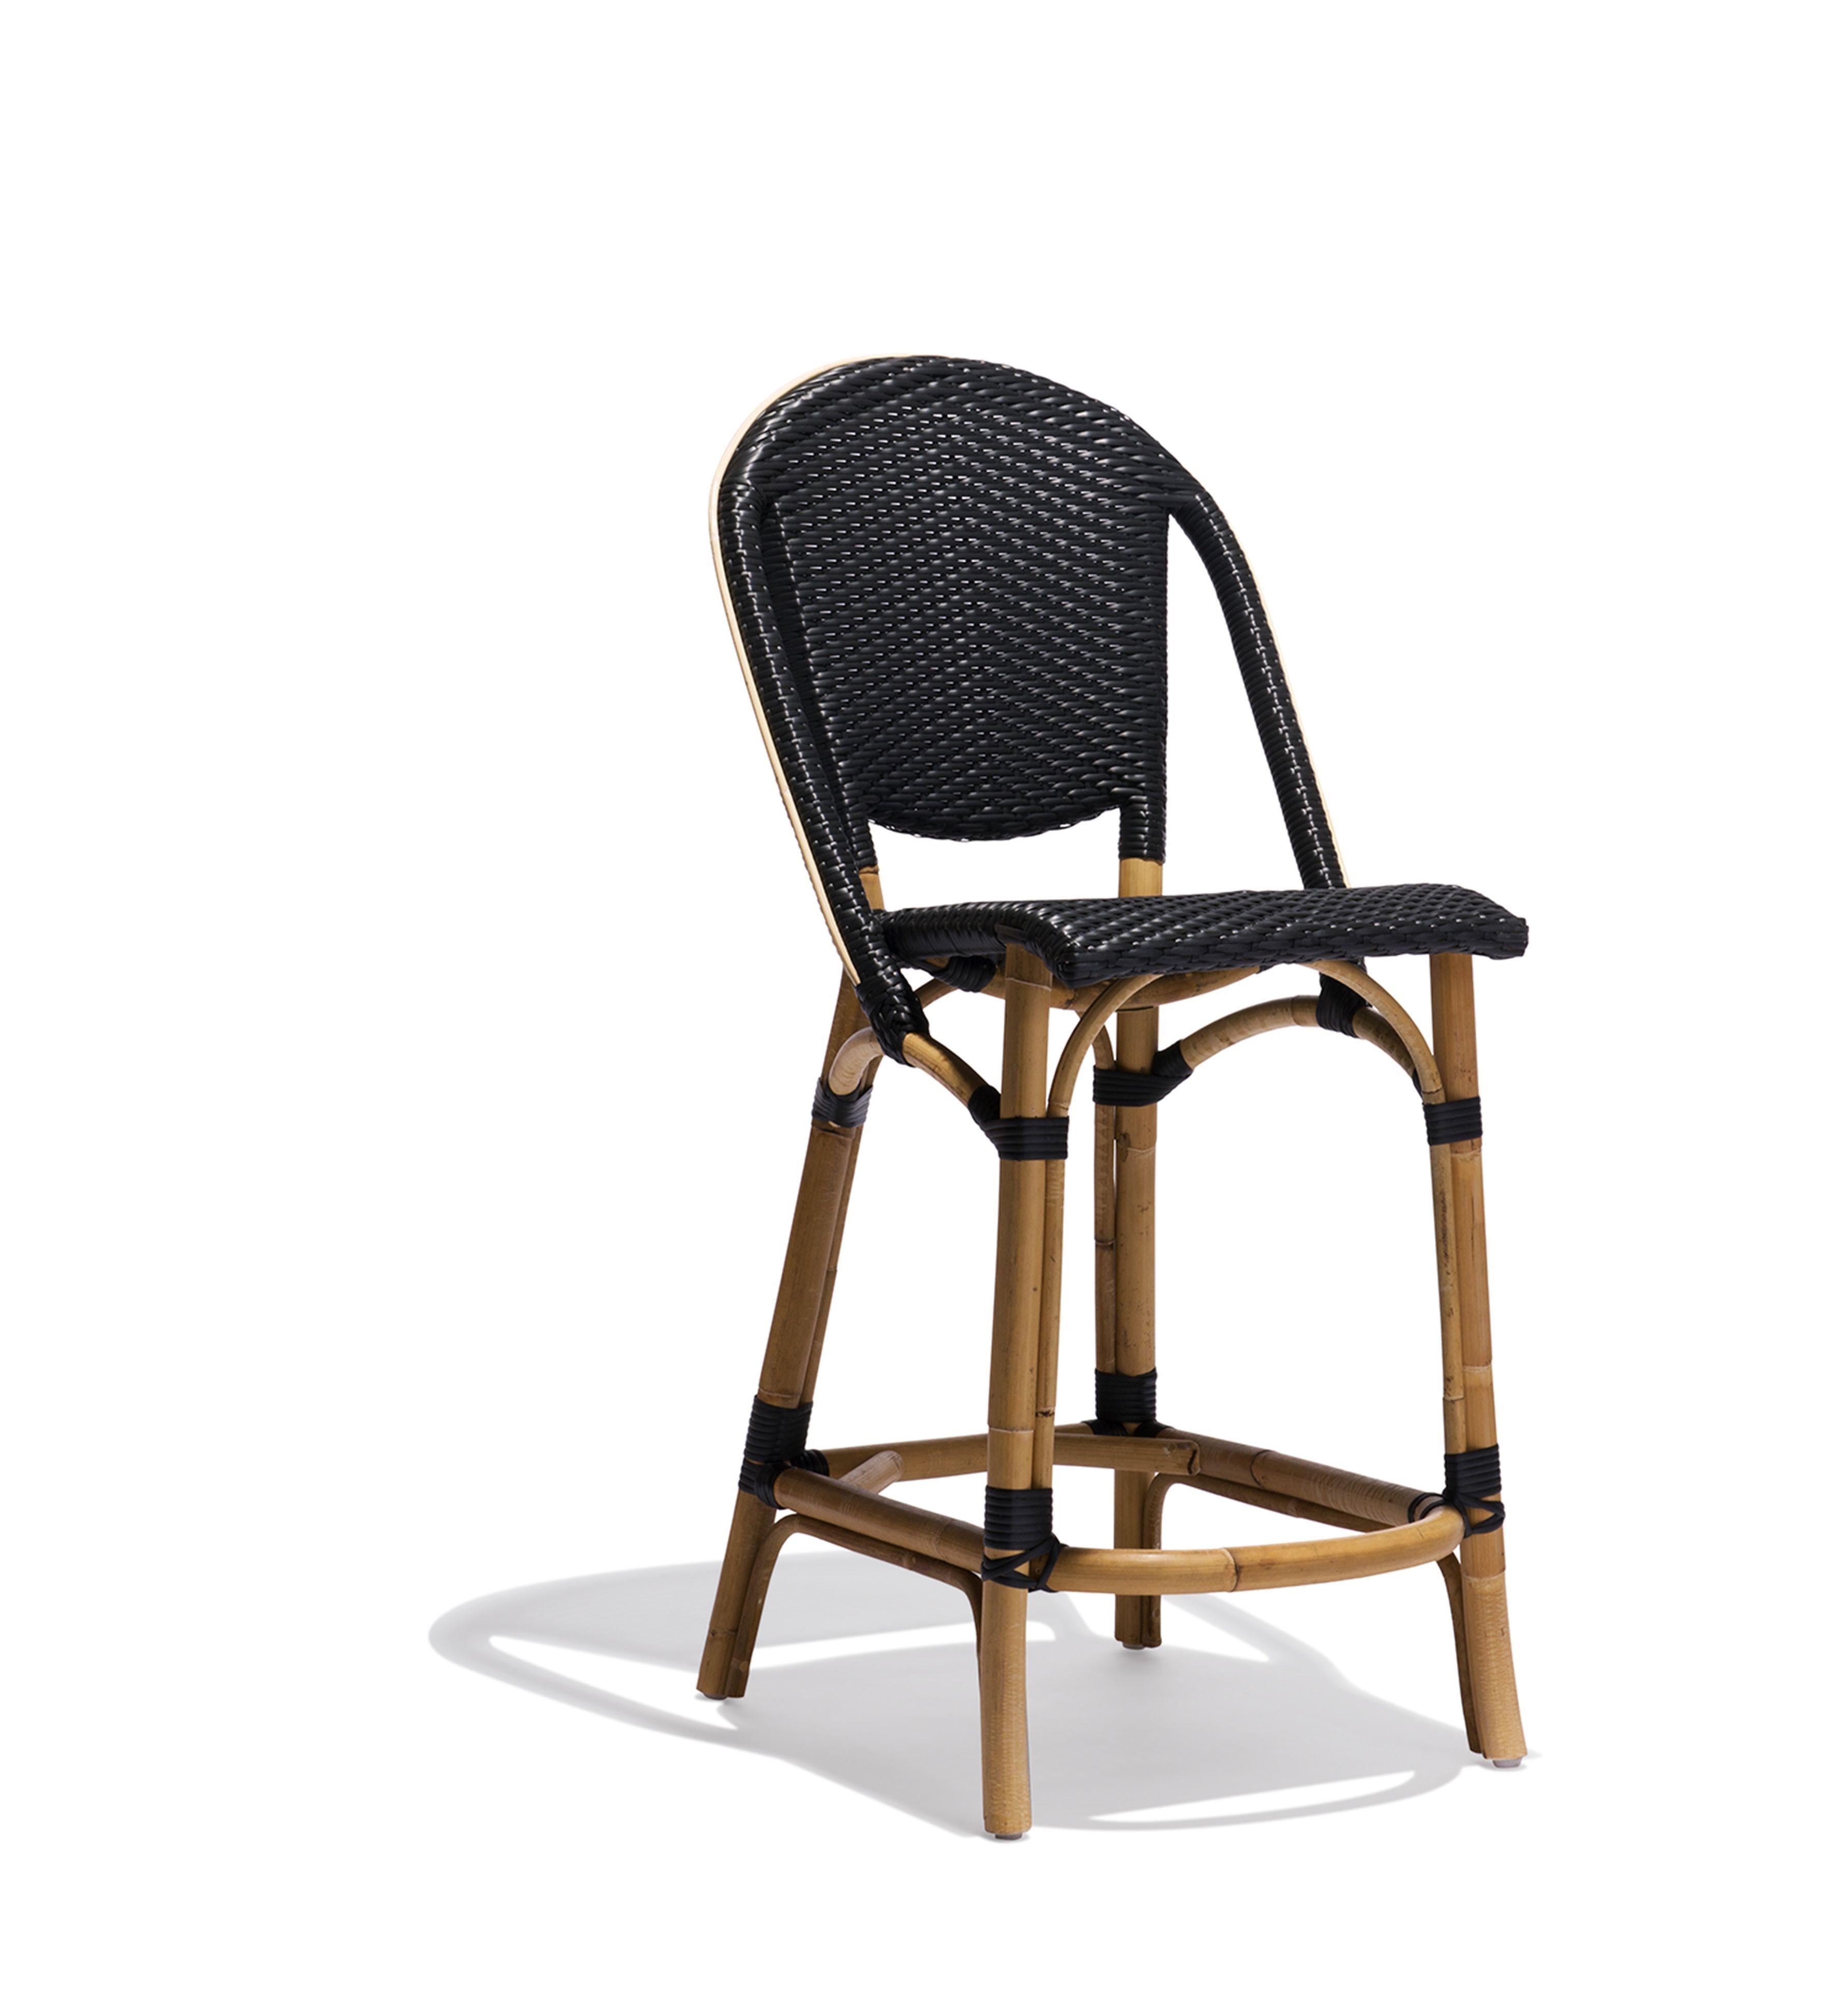 do rolling diy pinterest pin stool shop stools wilker s